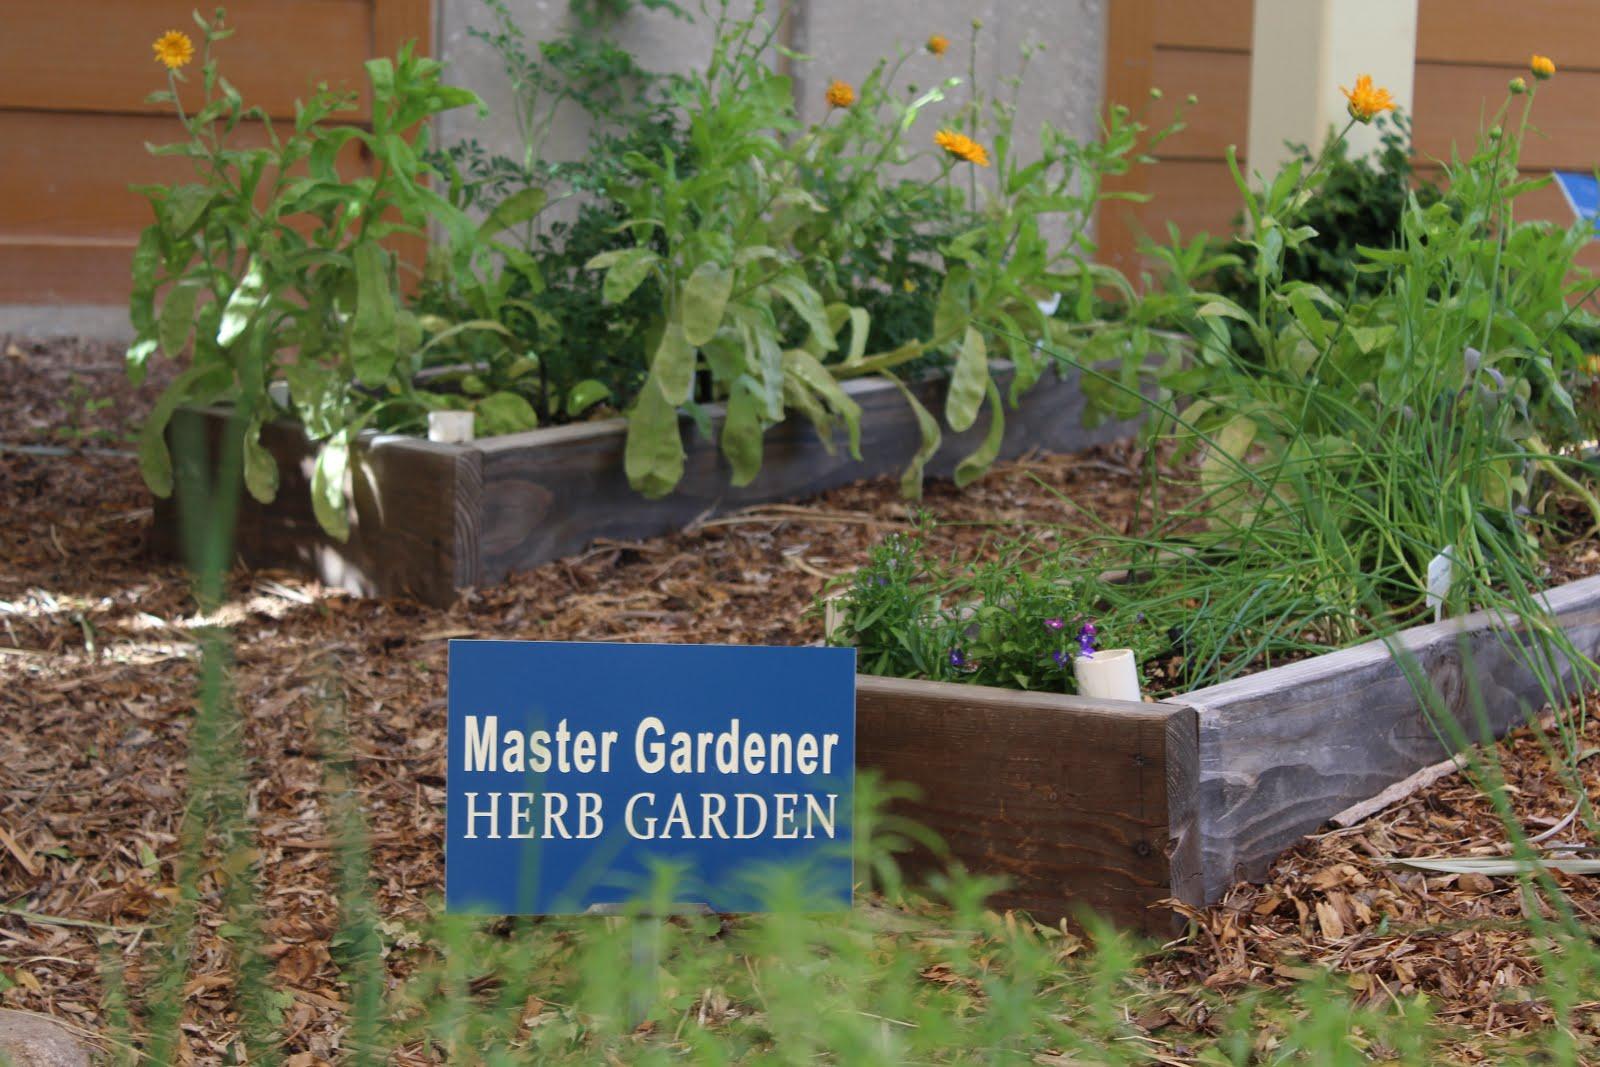 Star Nursery Blog: Stunning Herb Garden Ideas You'll Want